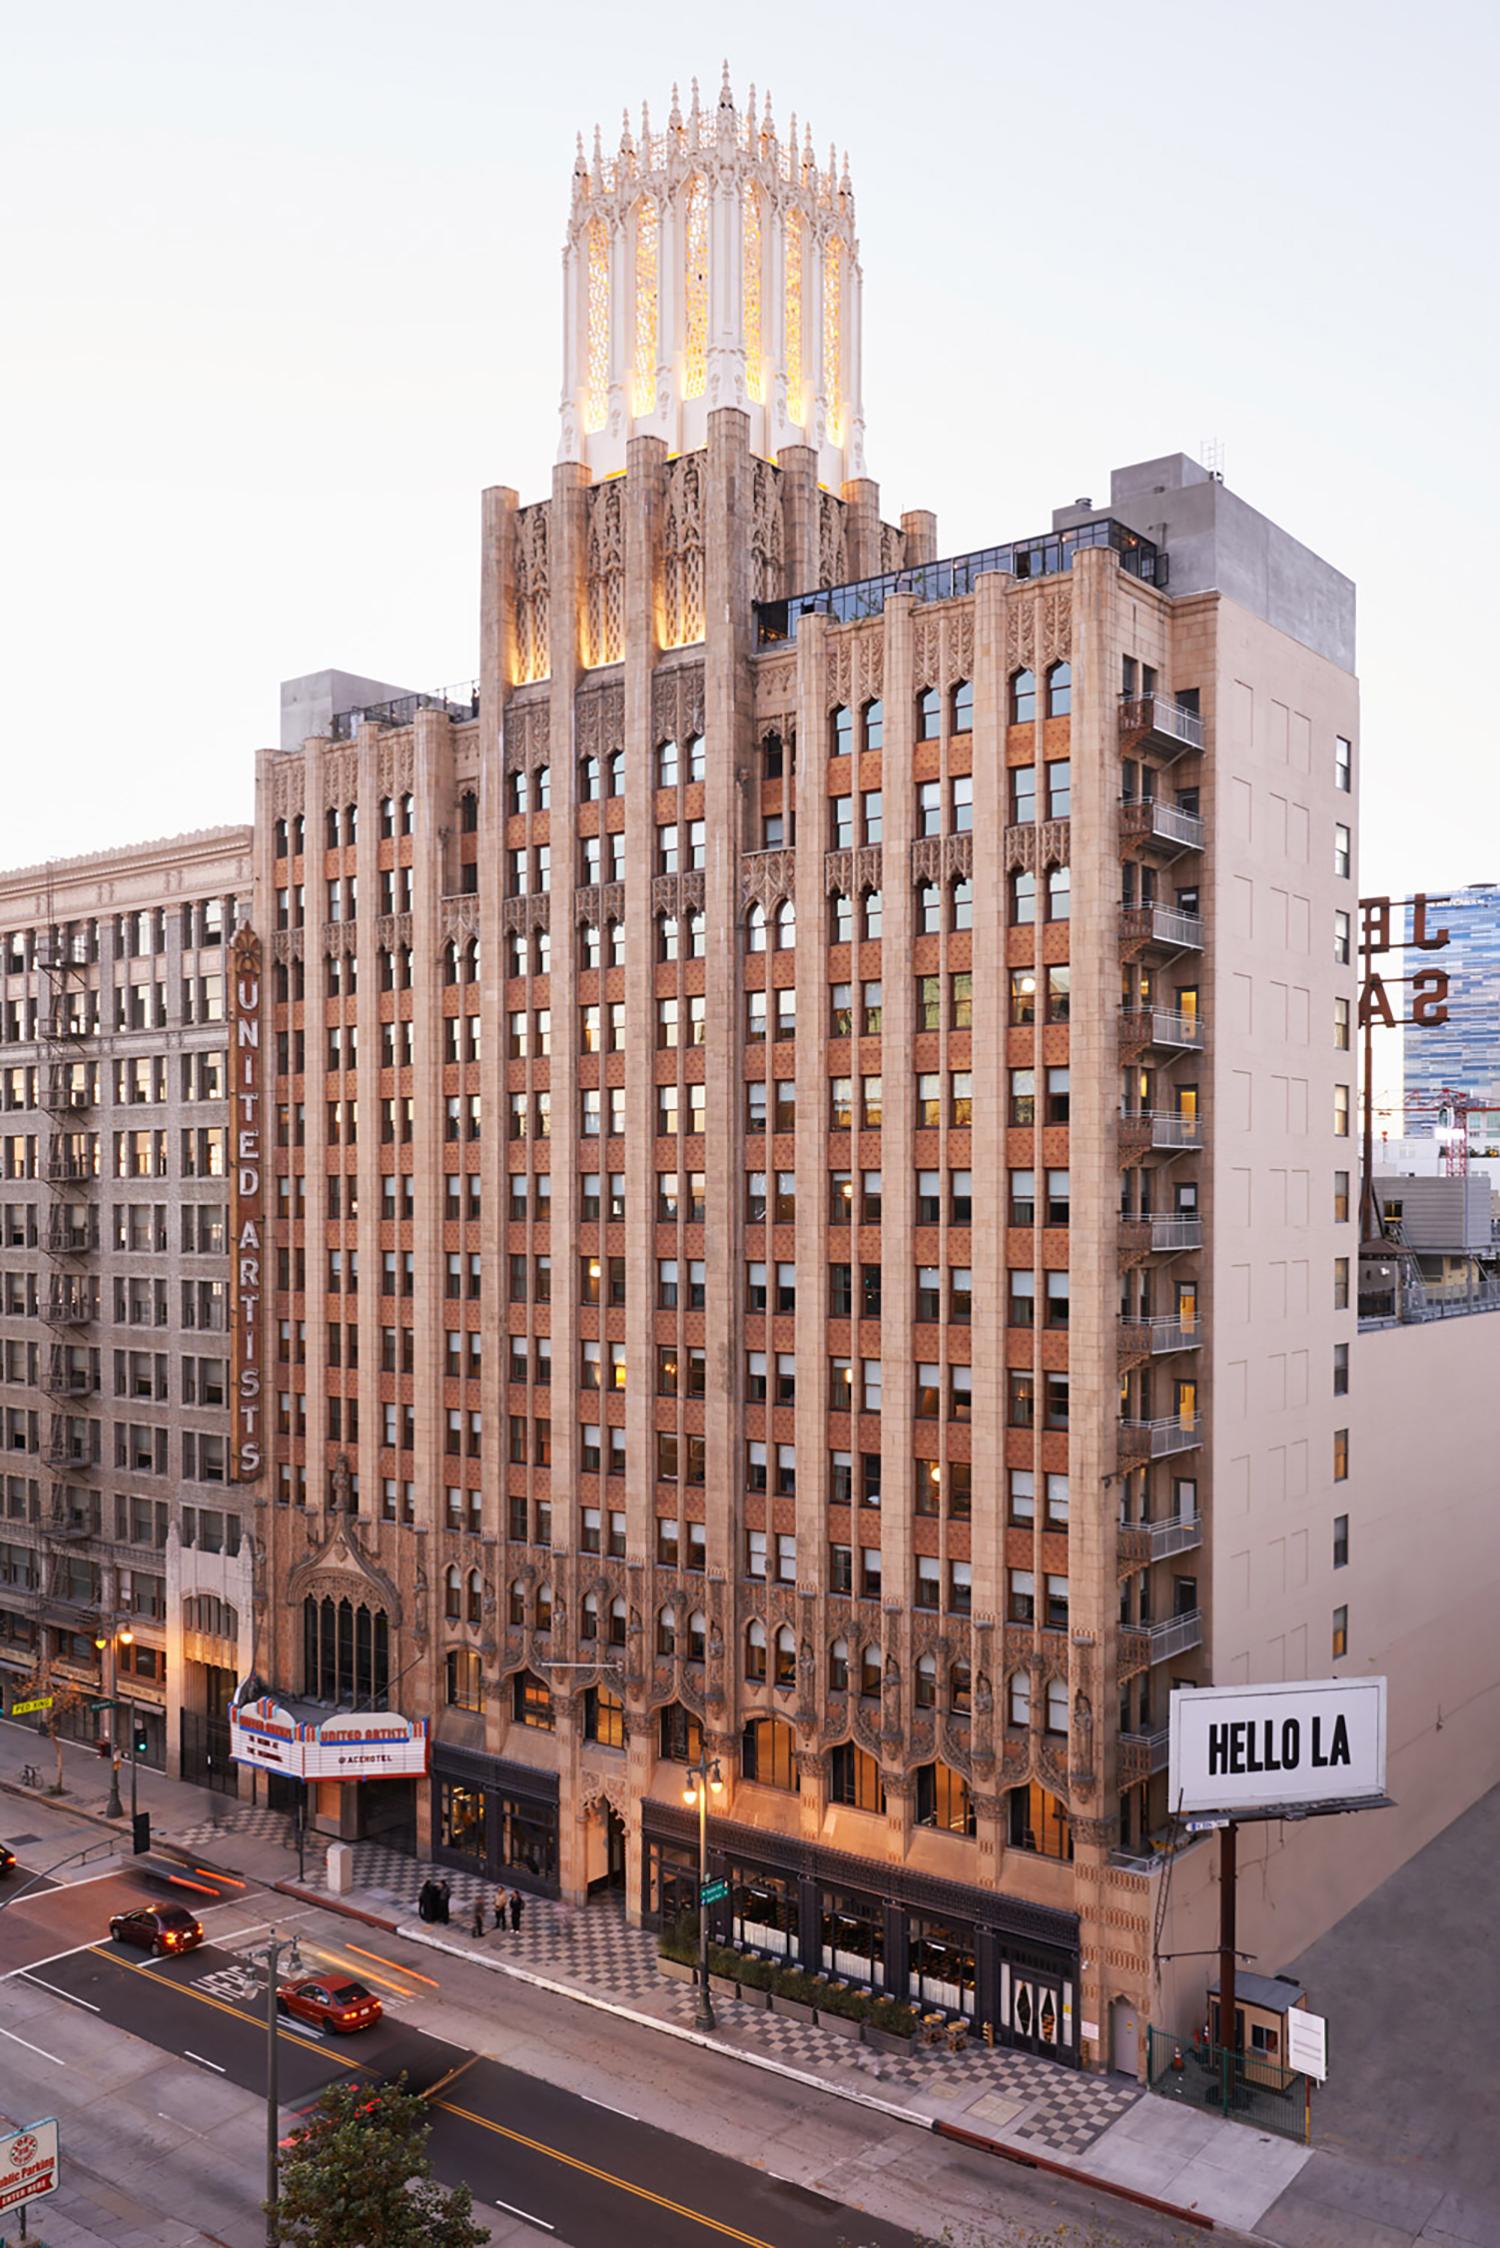 Ace Hotel, Los Angeles, California, 2014